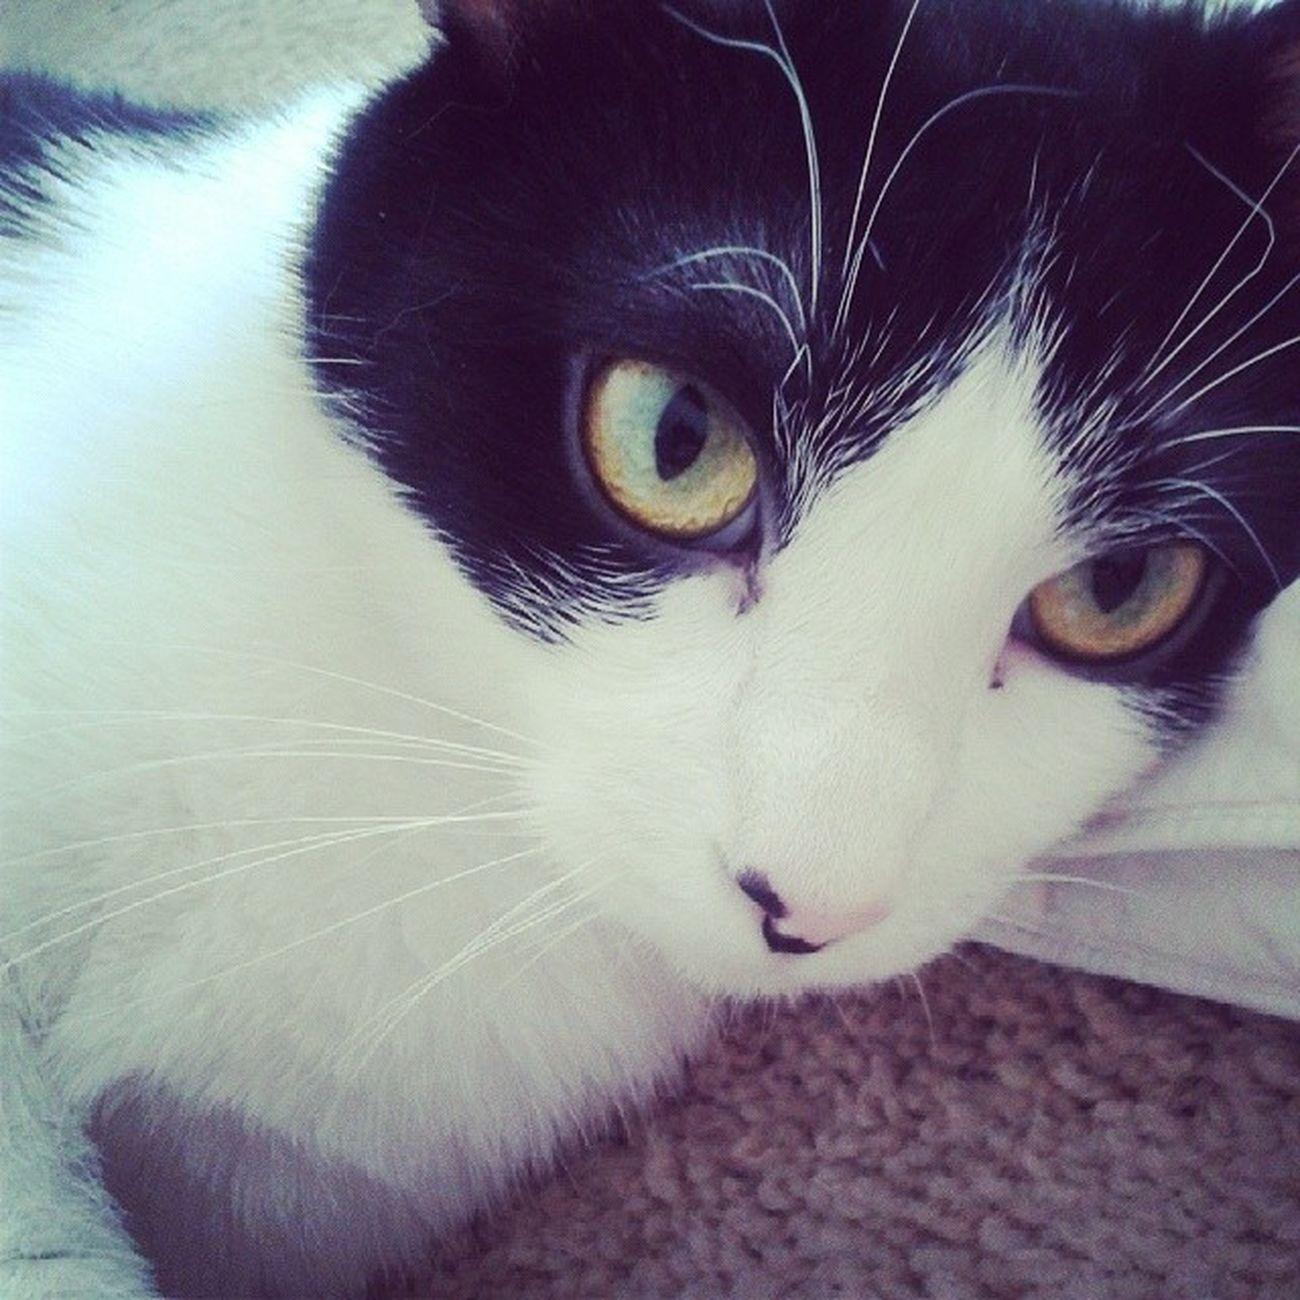 Catsofinstagram Lazycatdaze Themingming